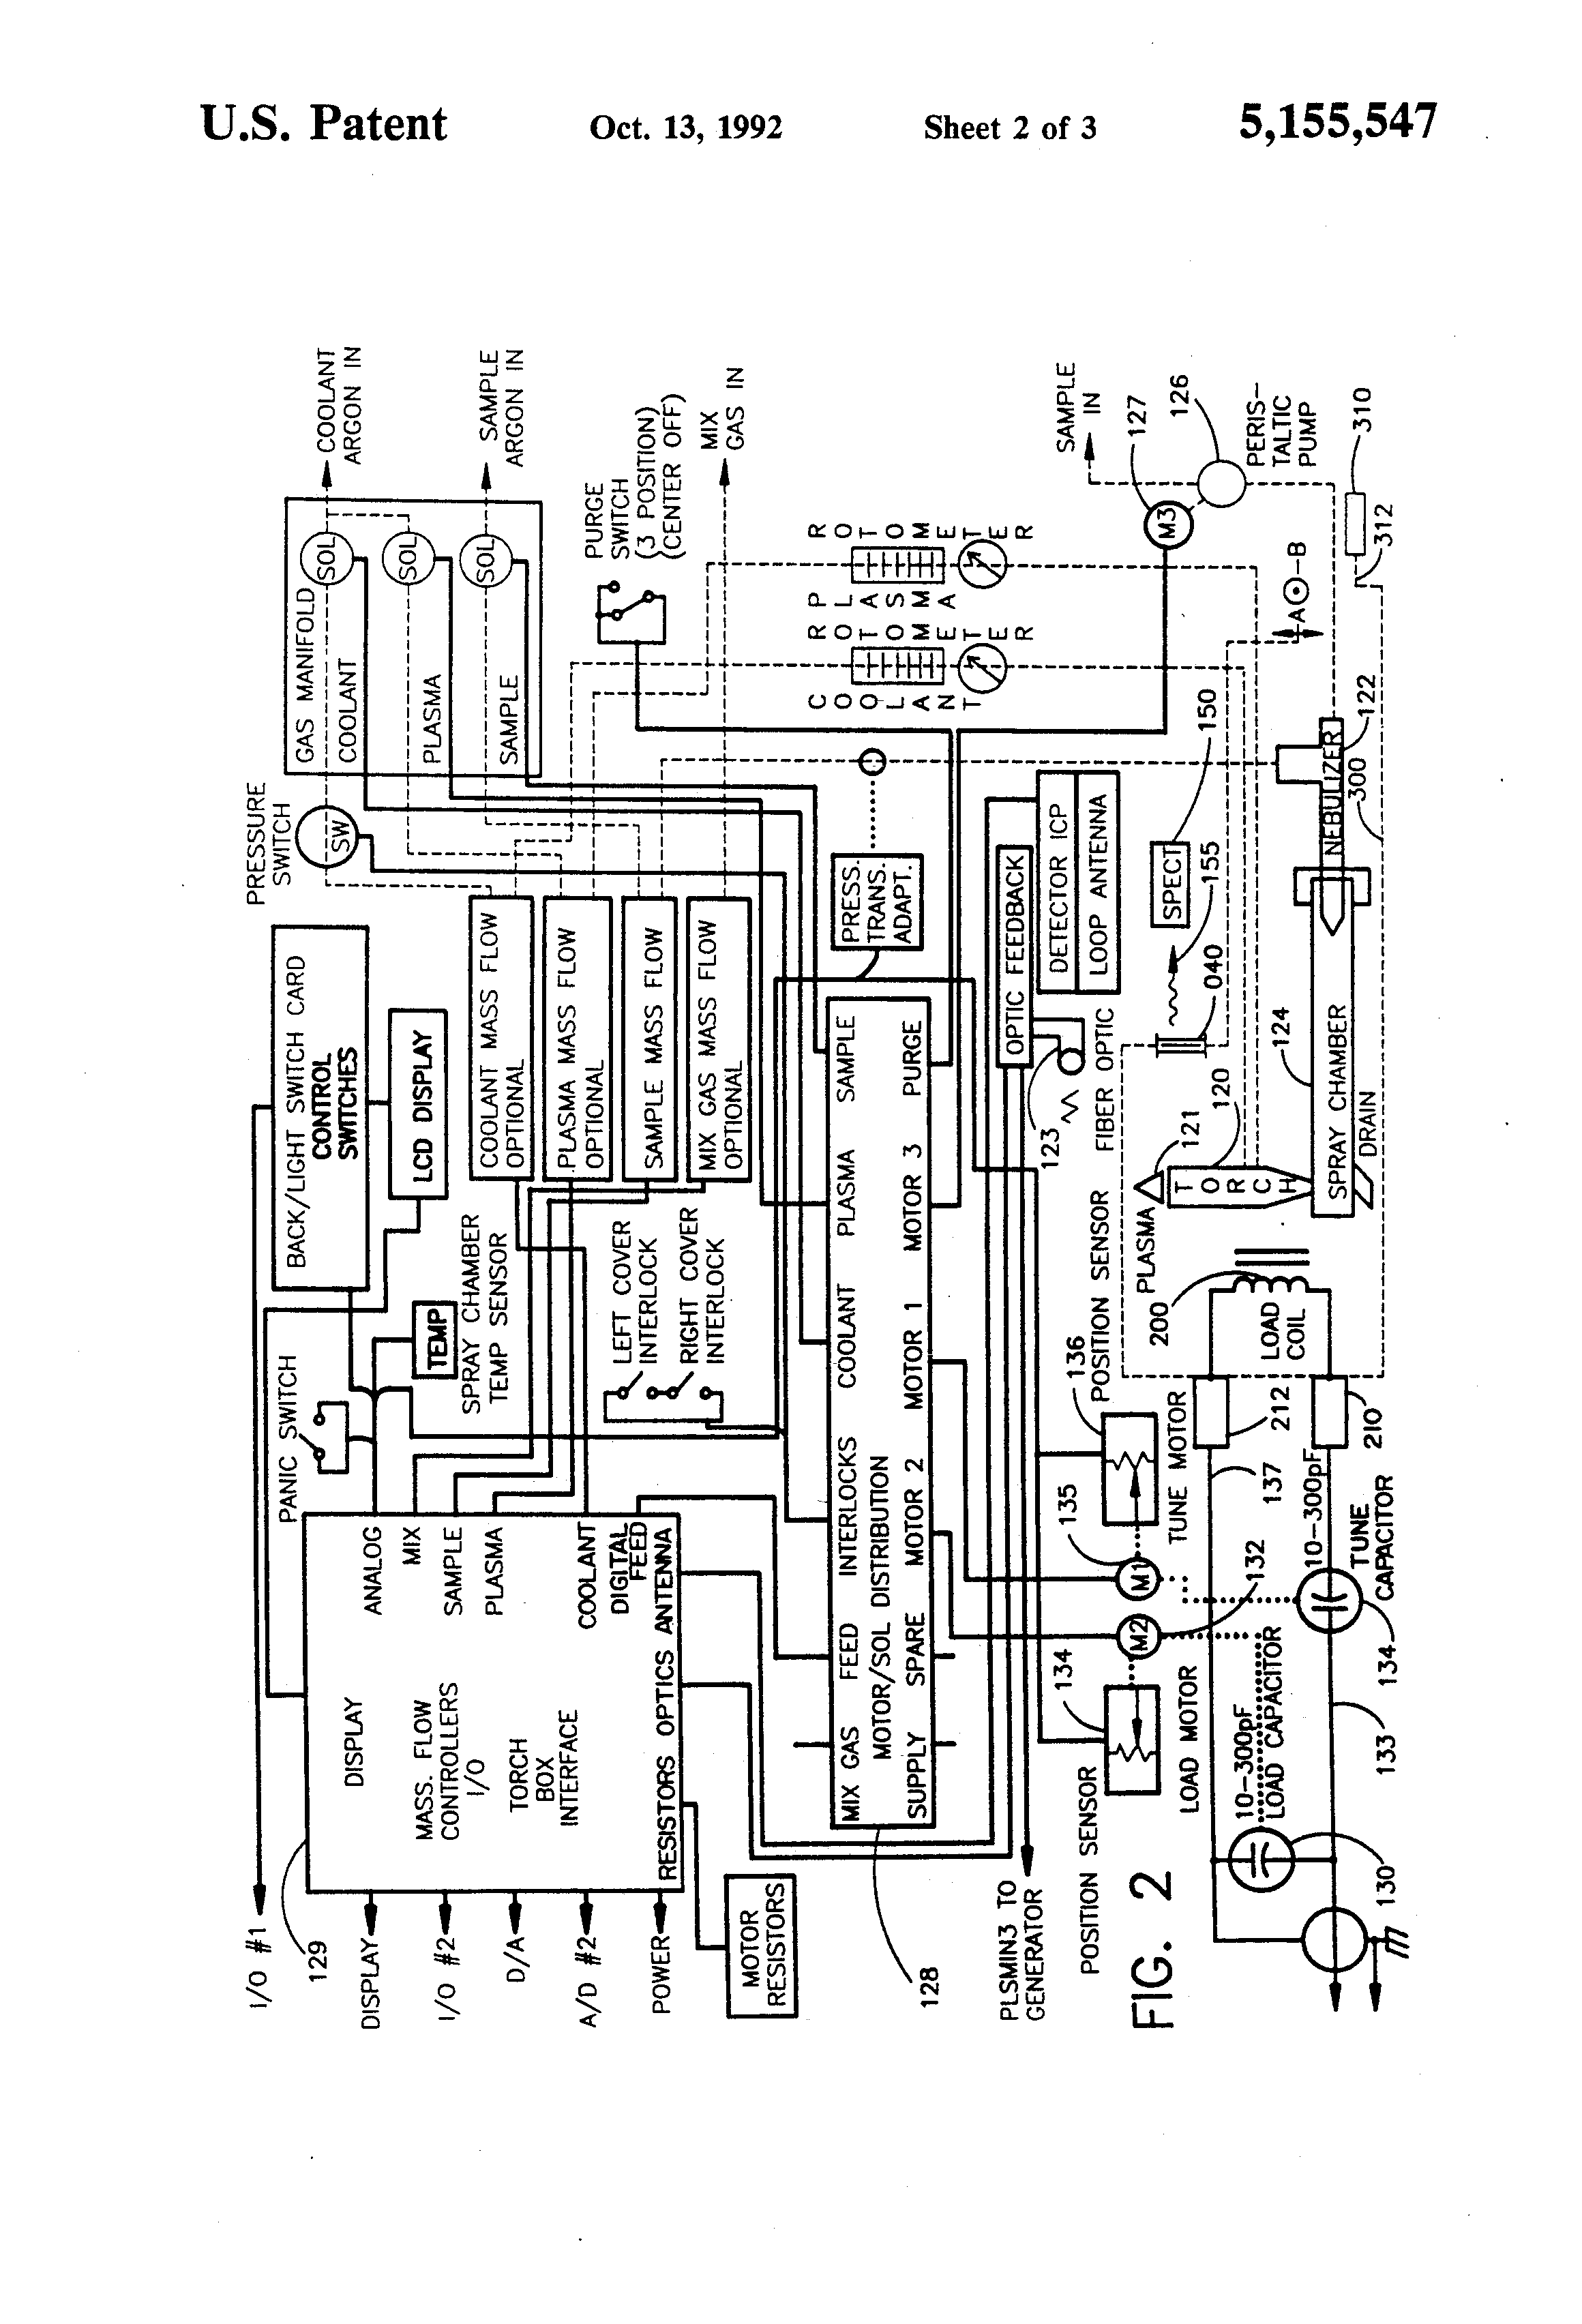 patente us5155547